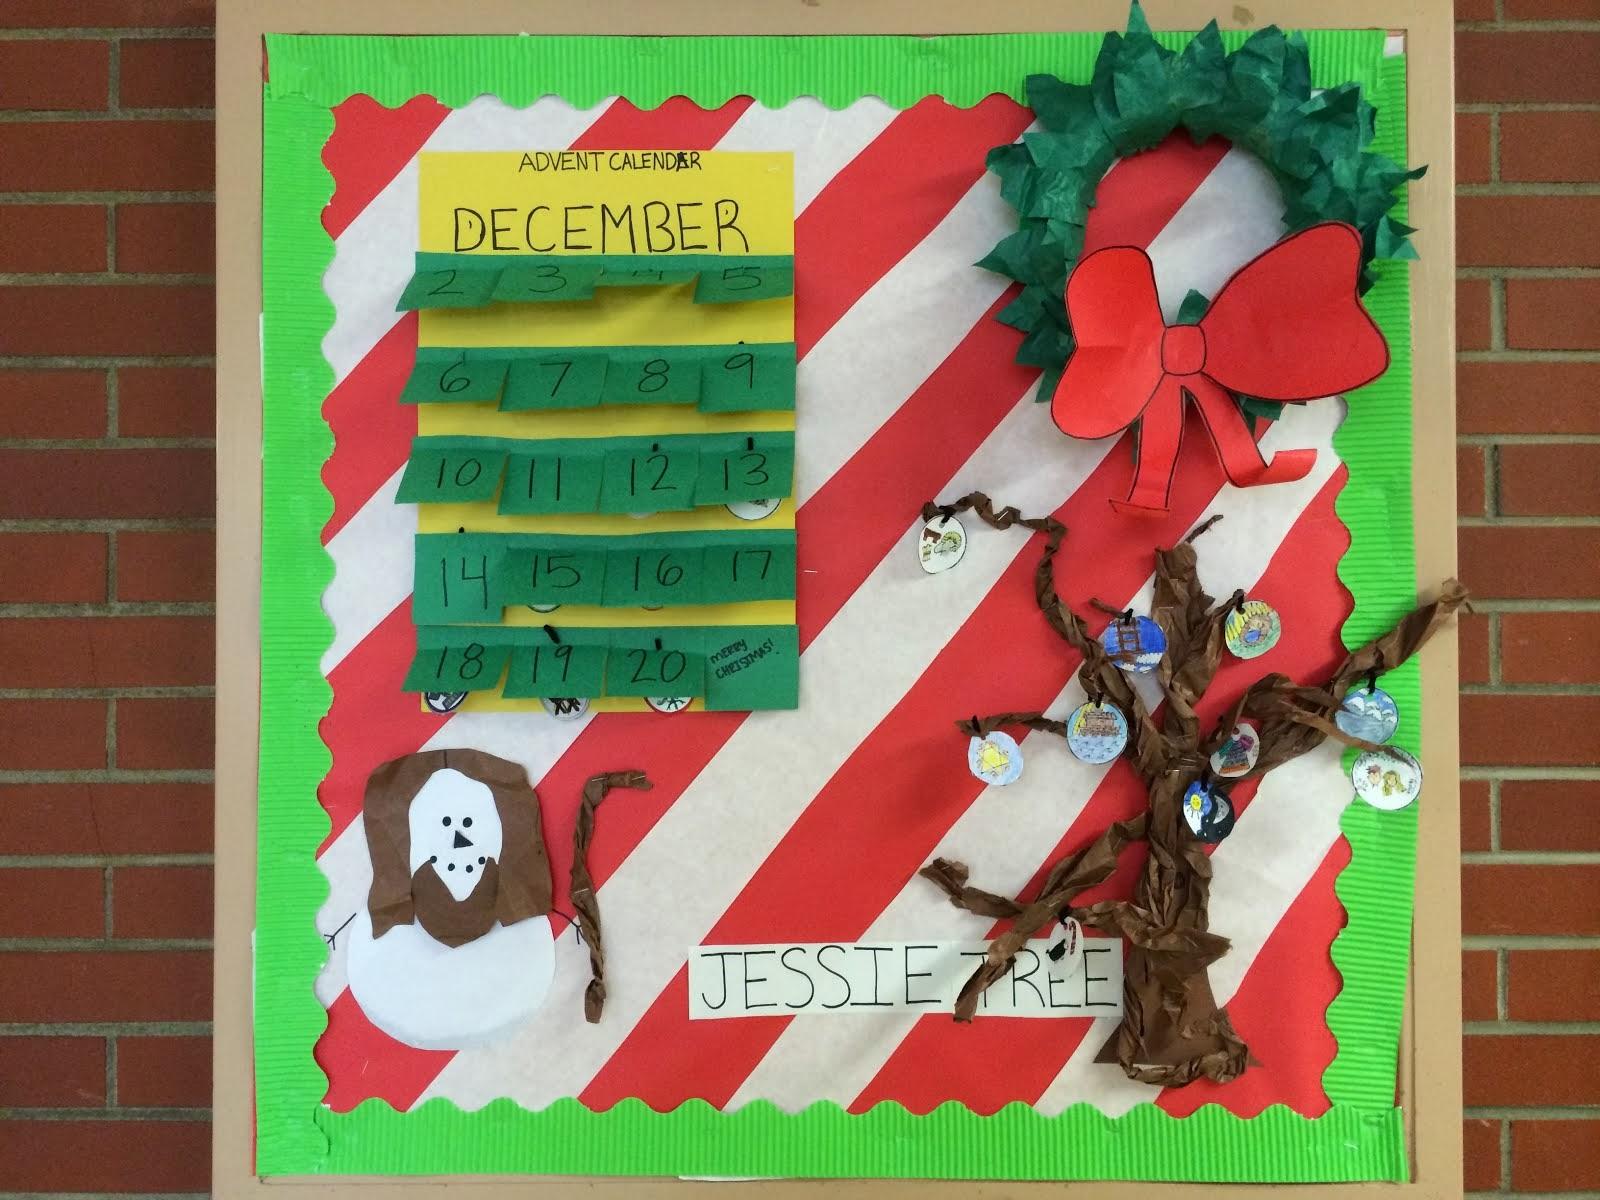 Advent Calendar Bulletin Board : The catholic classroom our school advent calendar jesse tree